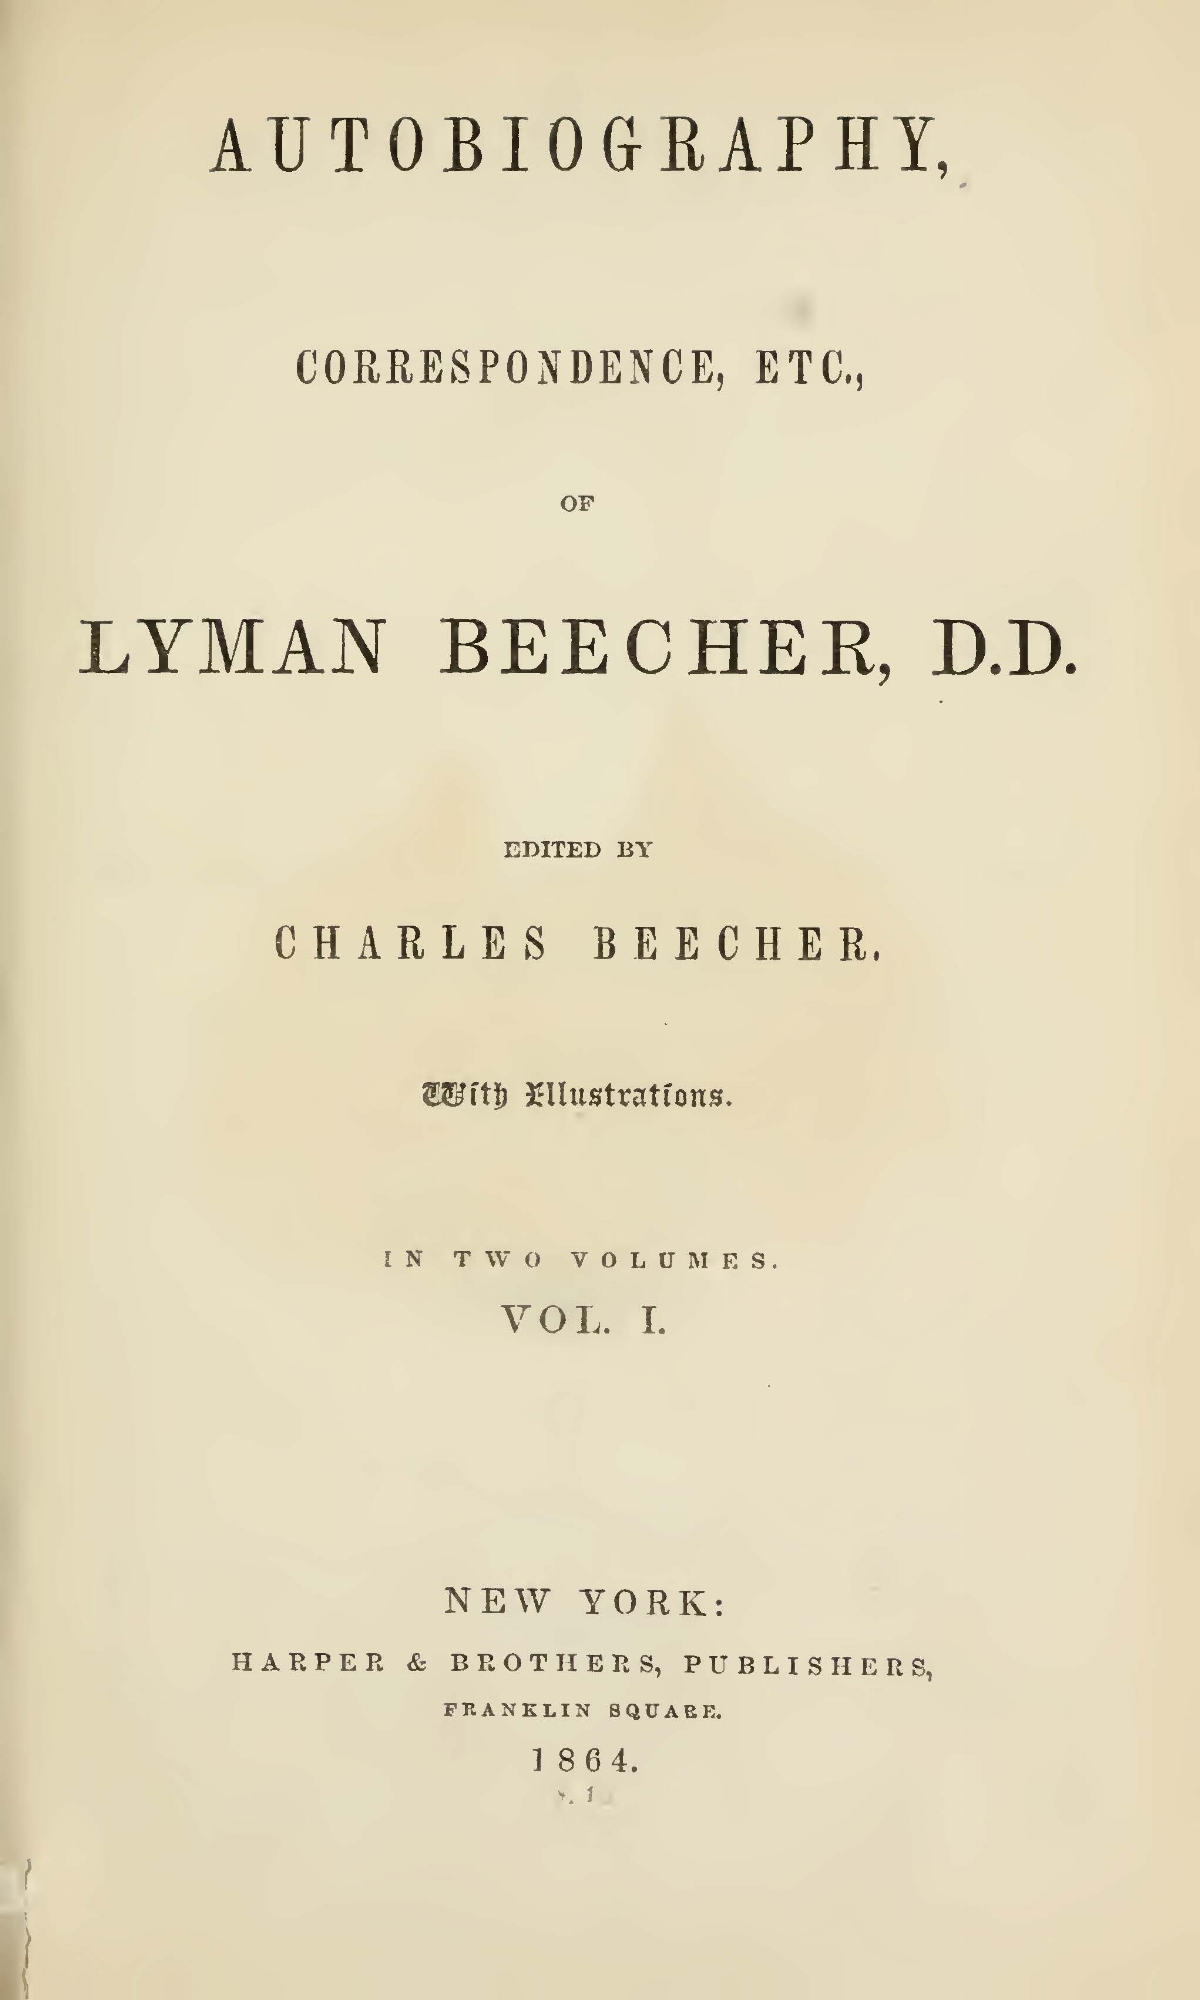 Beecher, Lyman, Autobiography, Correspondence, Etc., of Lyman Beecher, D.D., Vol. 1 Title Page.jpg